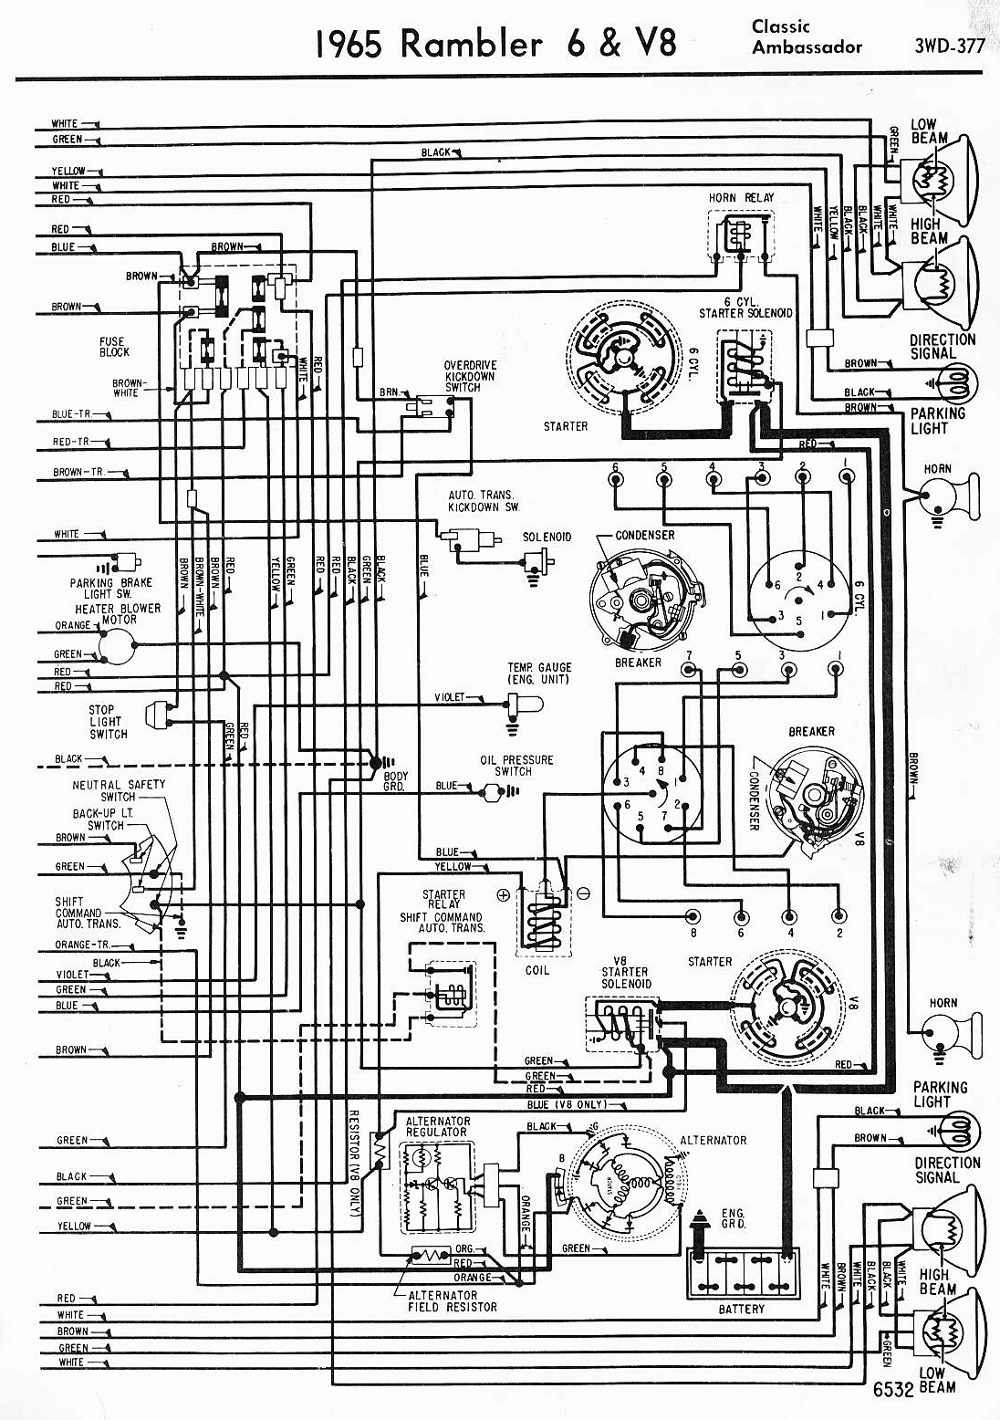 Snap Kancil Fuse Box Diagram 23 Wiring Images Perodua Engine Amc Rambler American Harness 35 Diagrams Originalpart